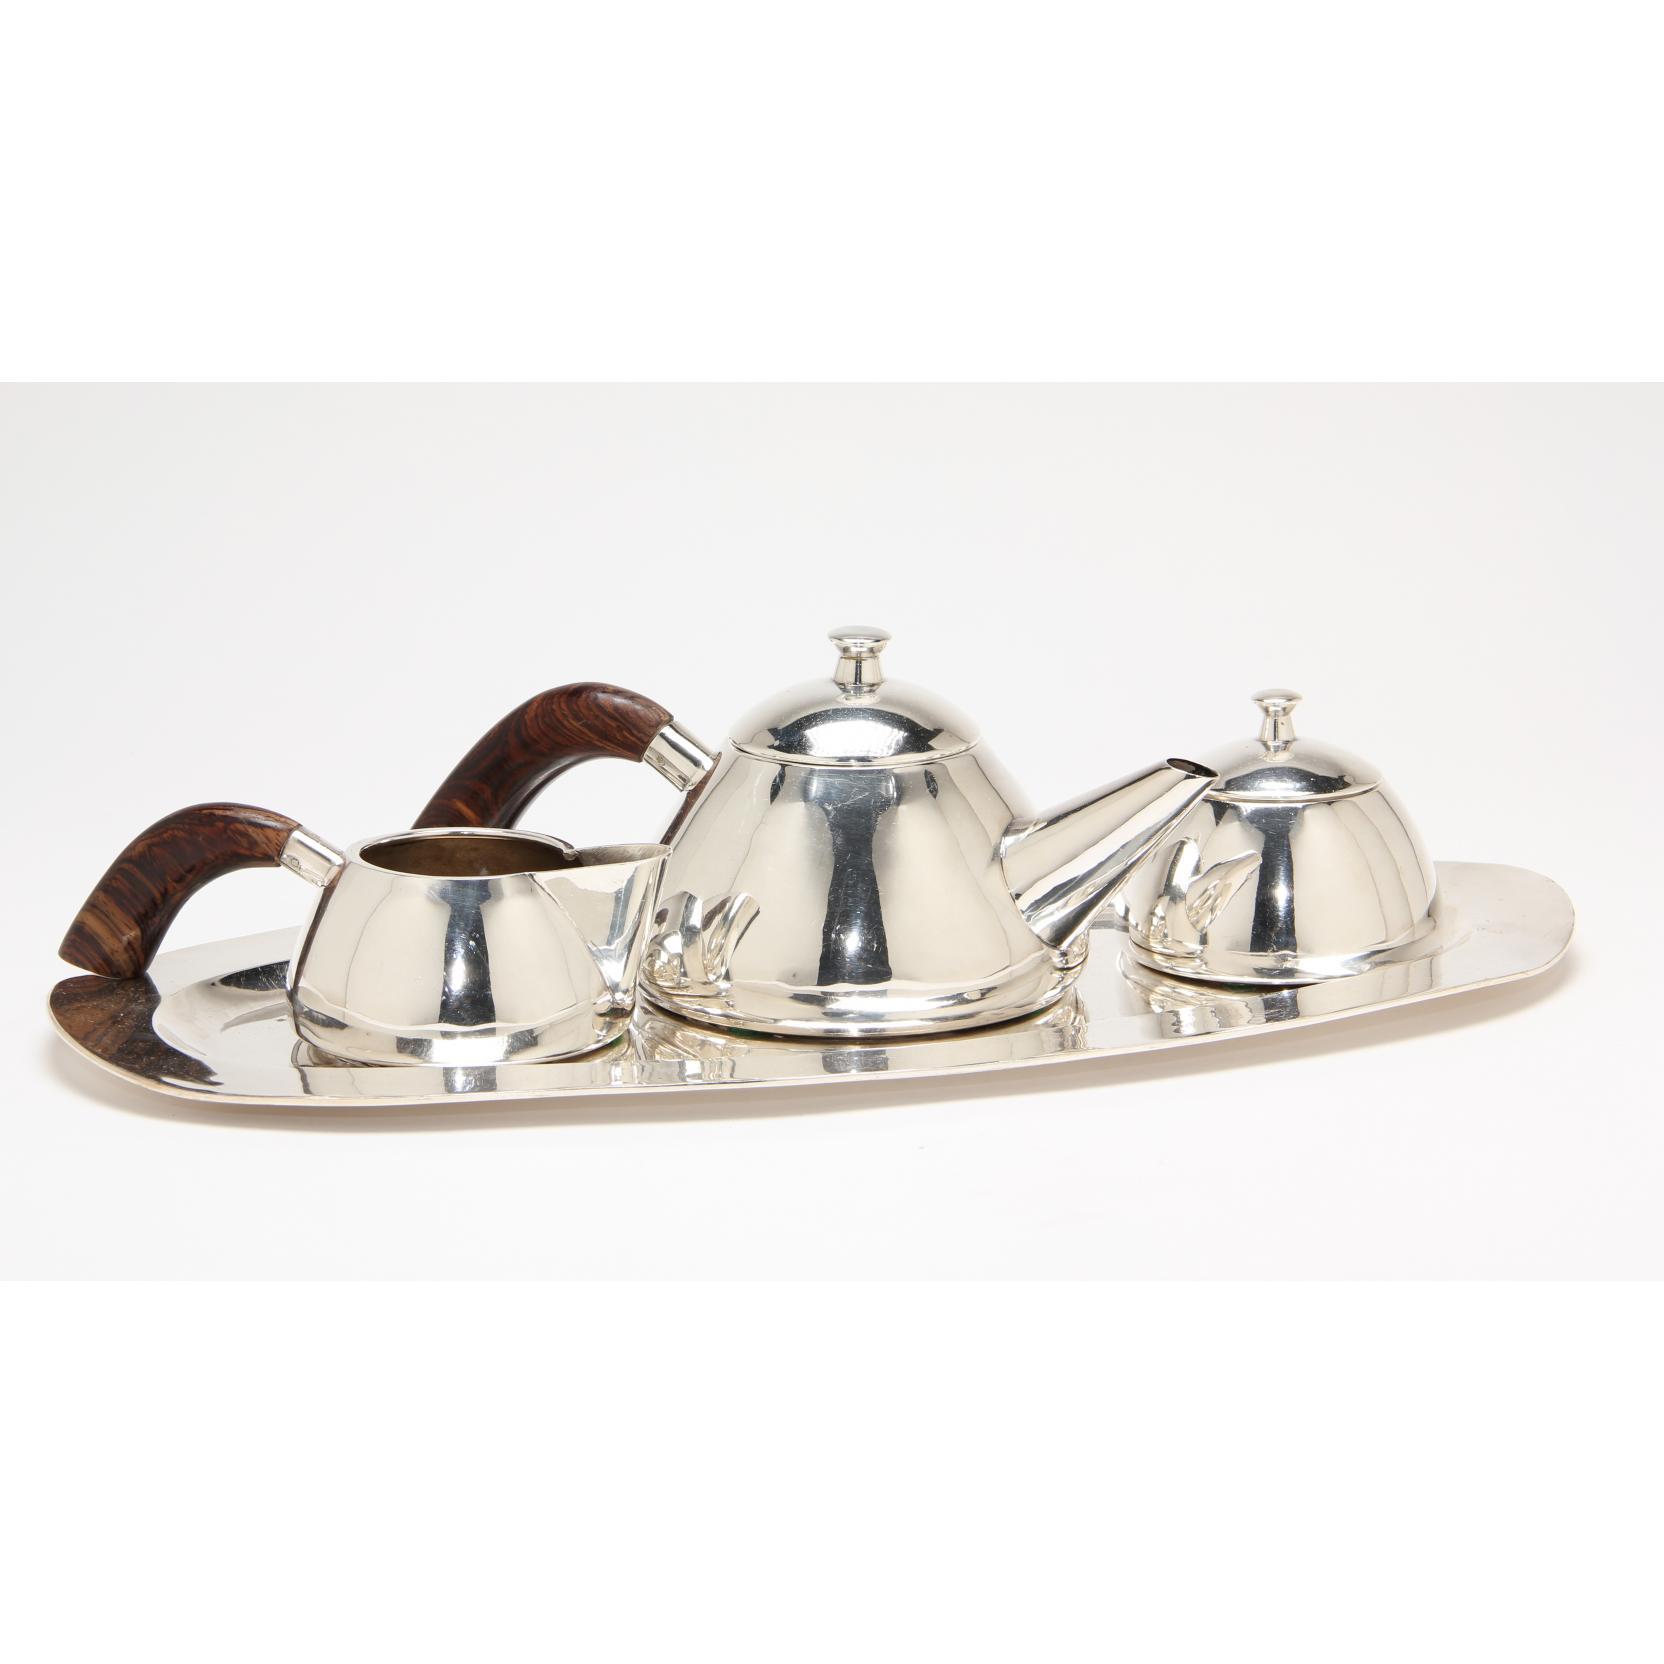 art-moderne-style-silverplate-tea-set-mexican